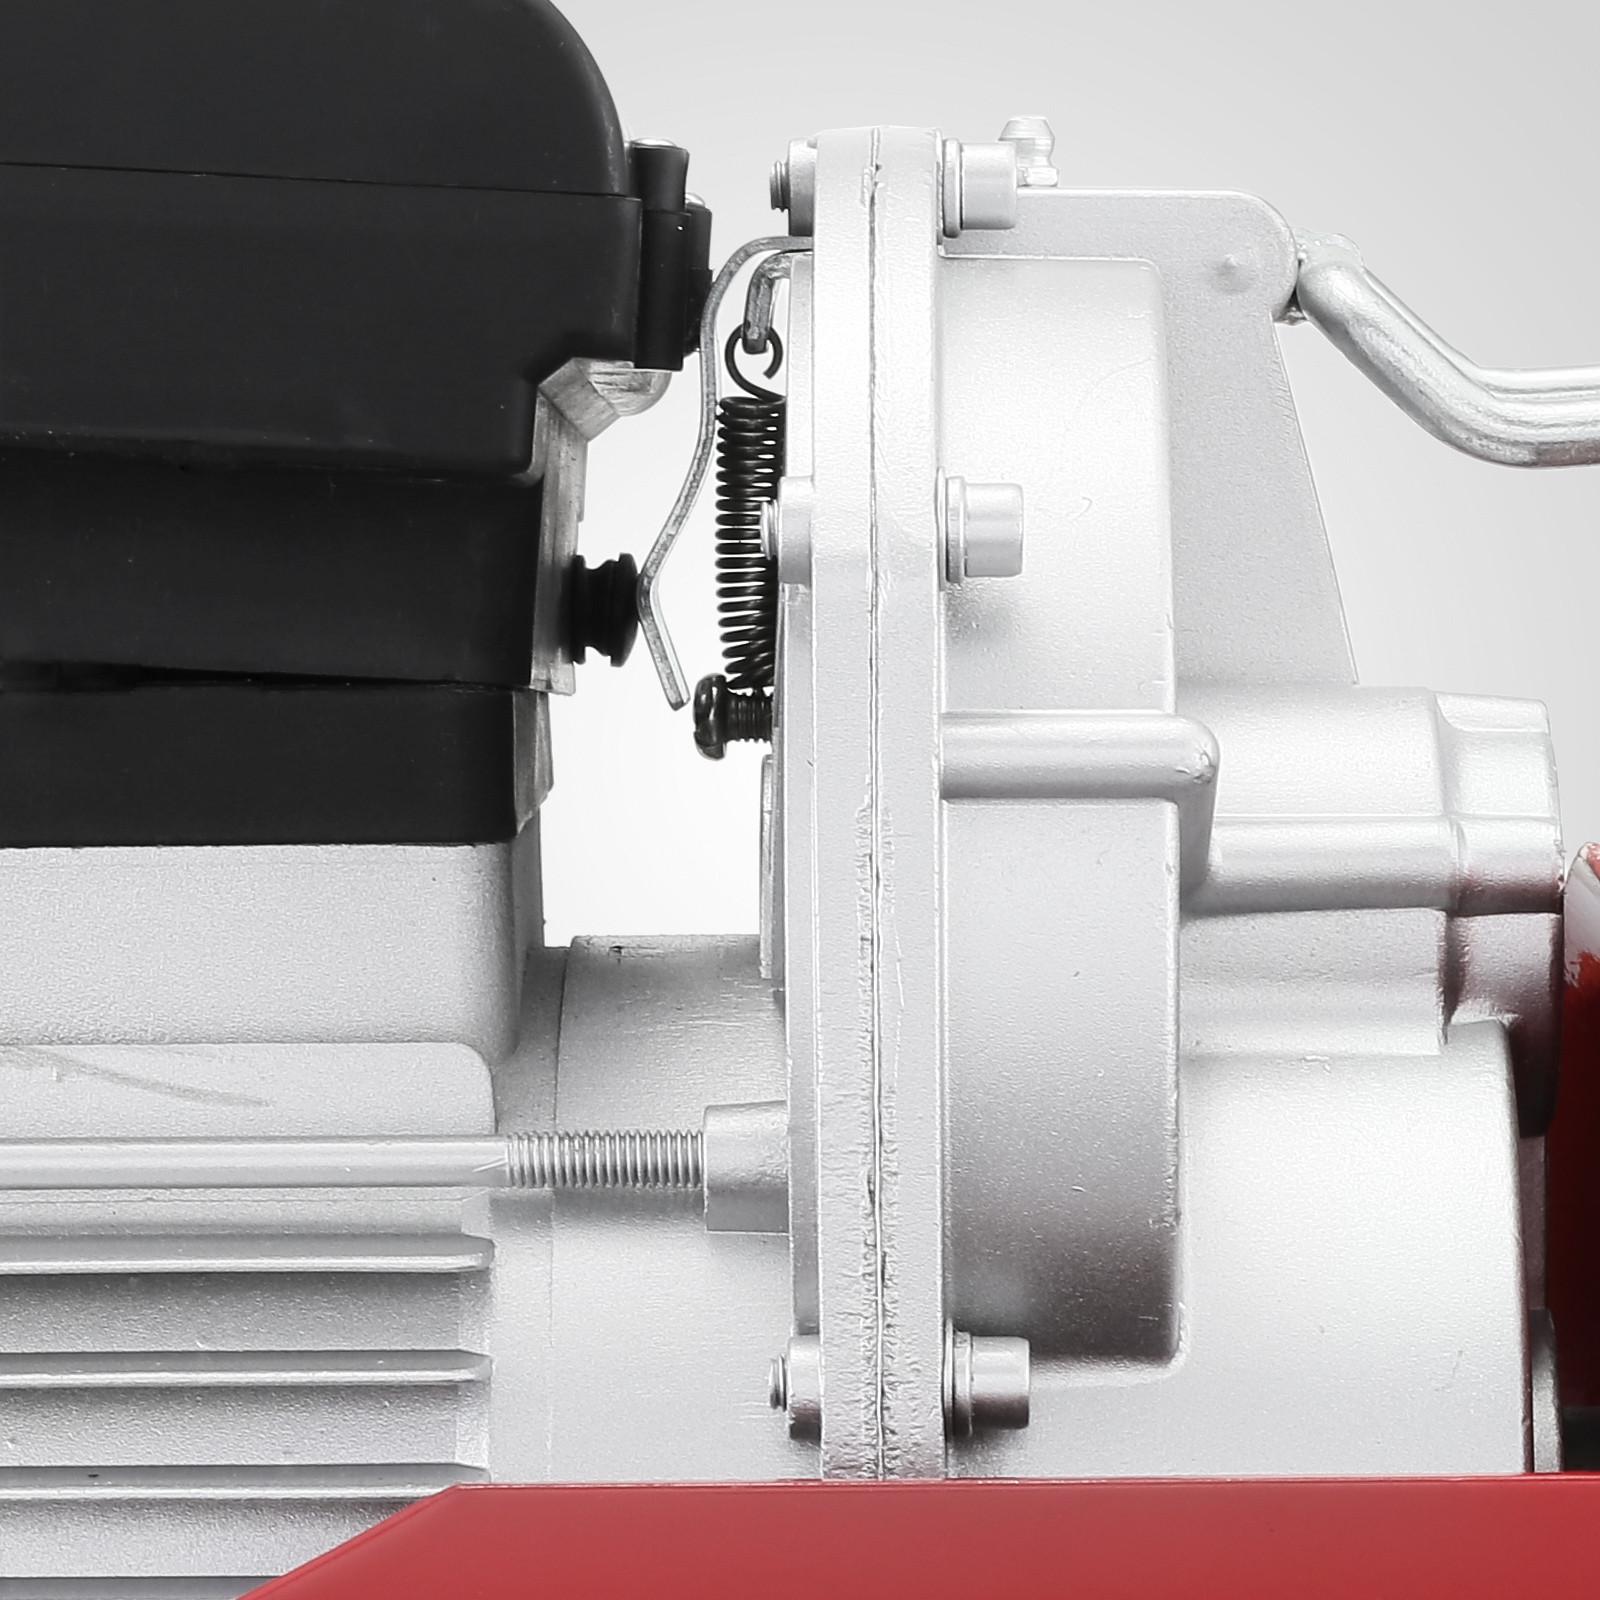 100kg-900kg-Electric-Hoist-Winch-Lifting-Engine-Crane-Cable-Lift-Hook-Garage miniature 68